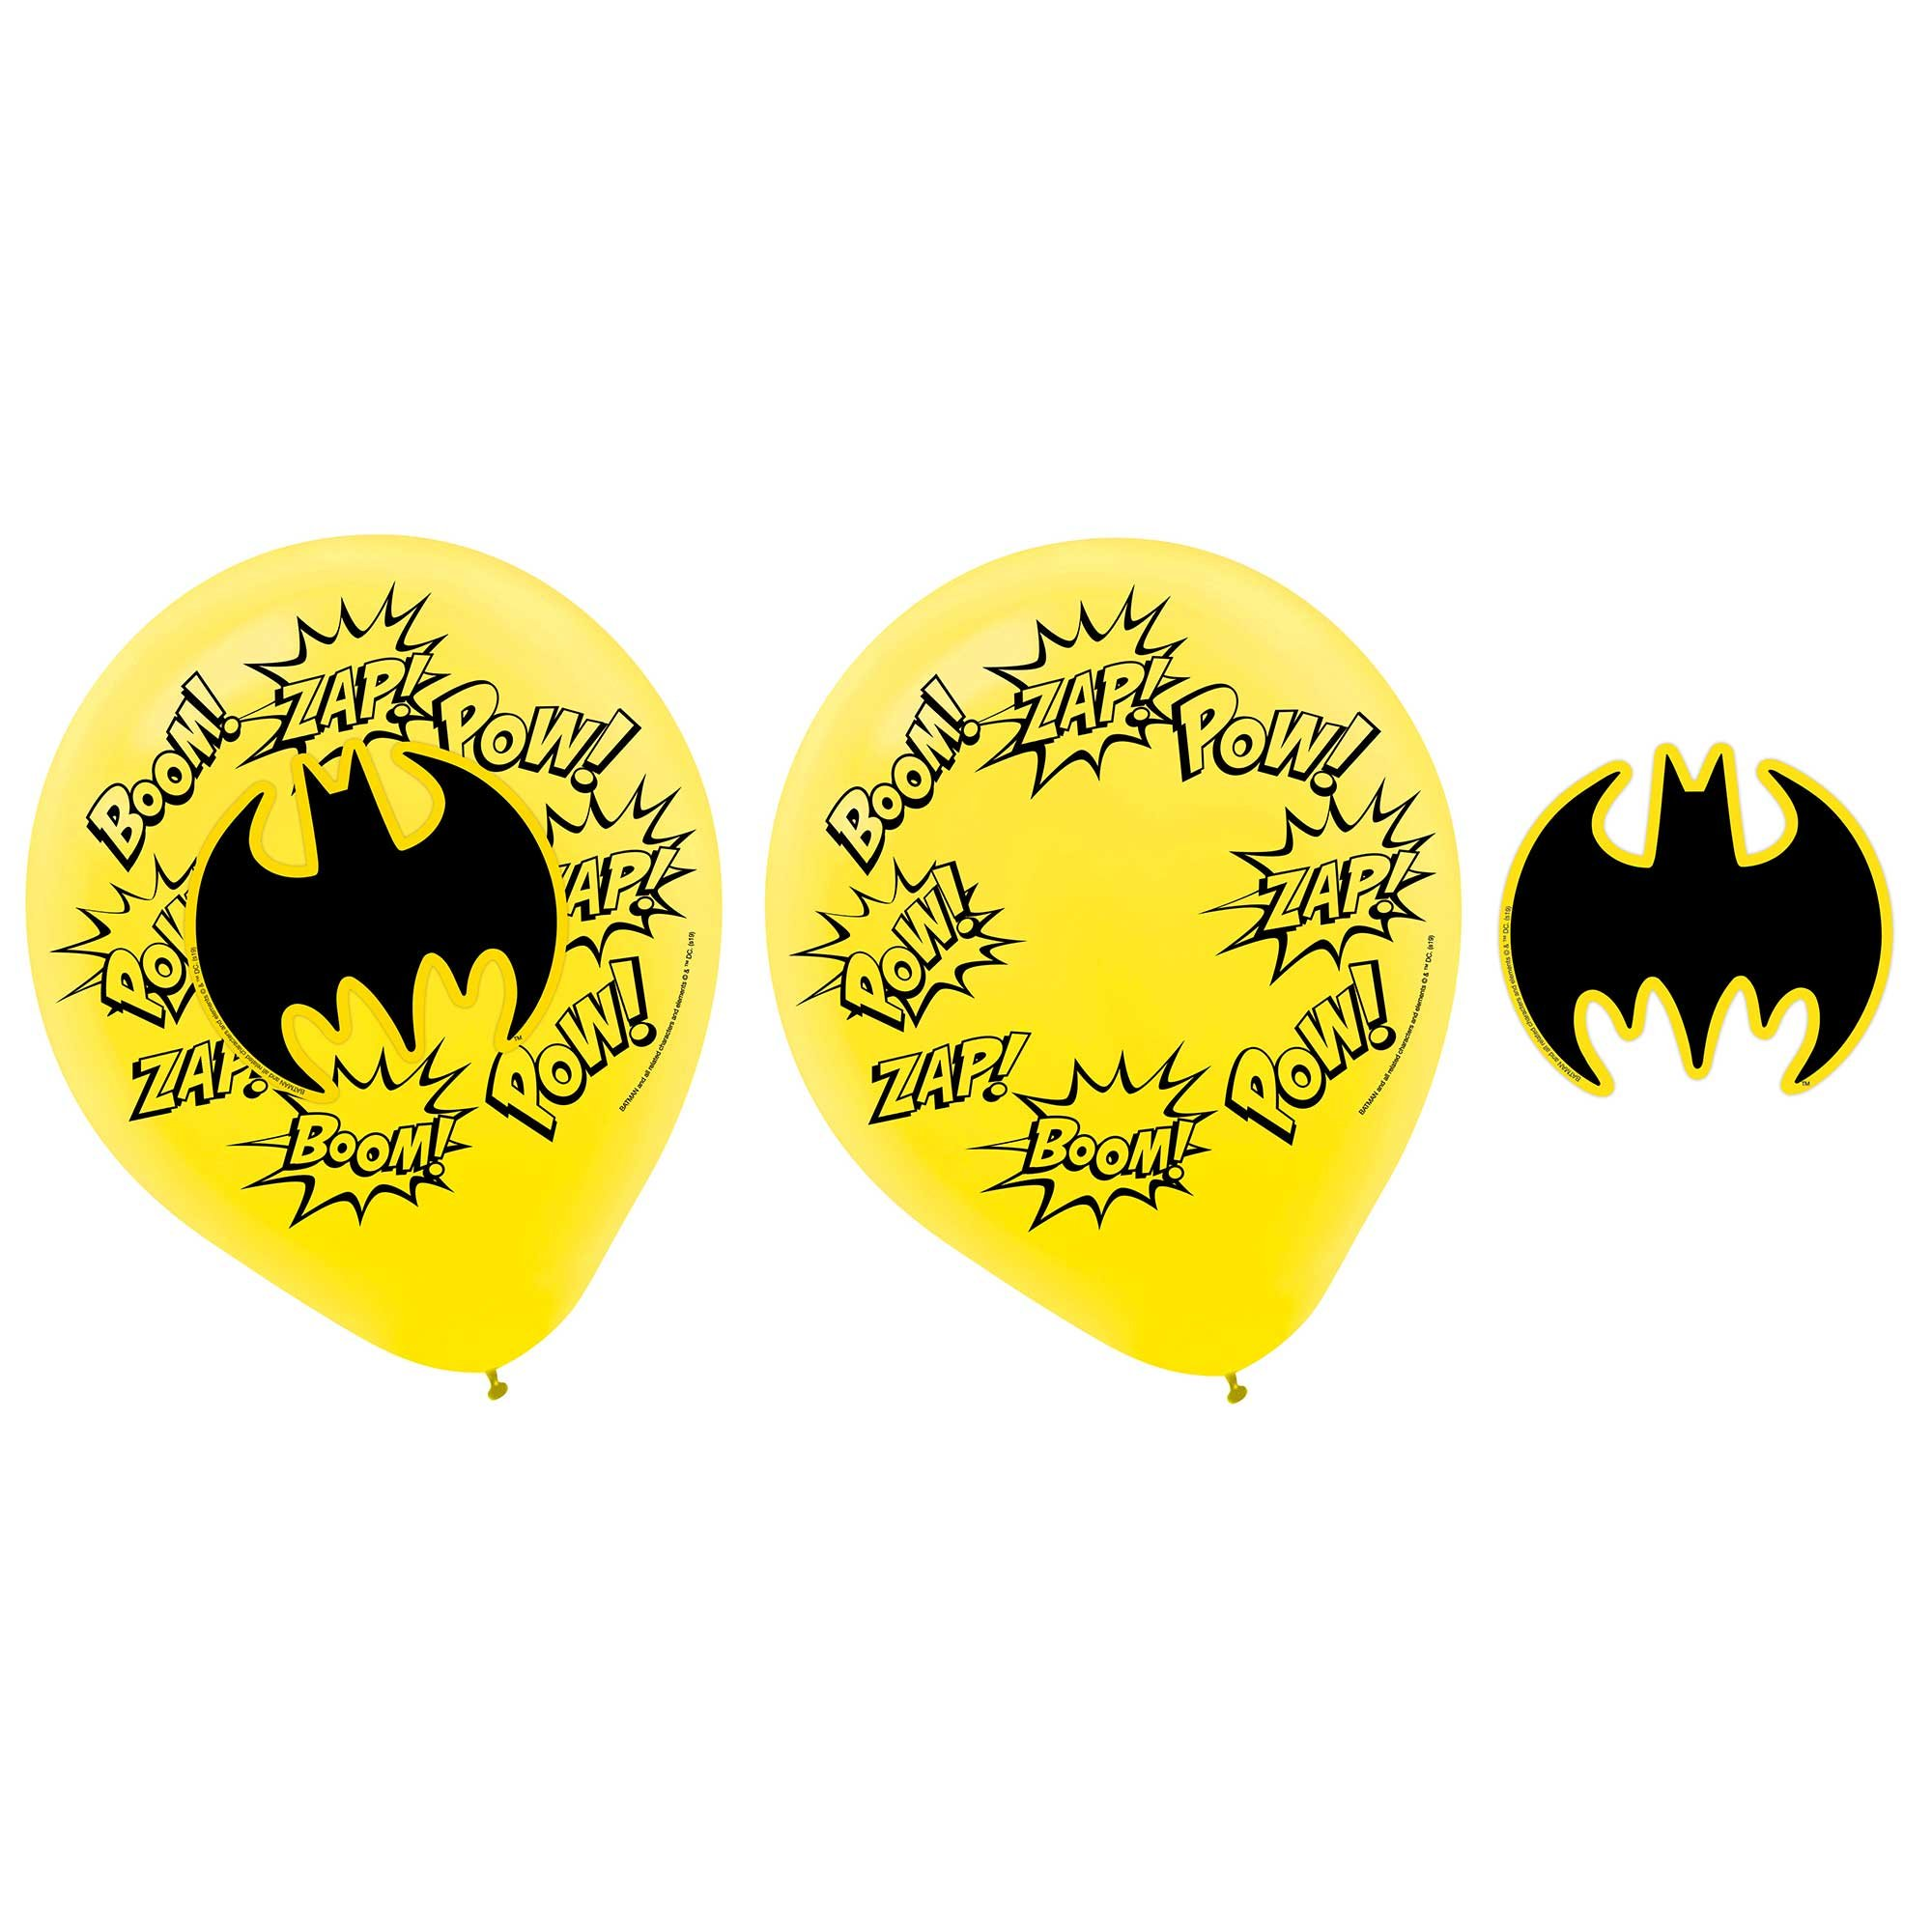 Batman Heroes Unite 30cm Latex Balloons & Paper Adhesive Add-Ons